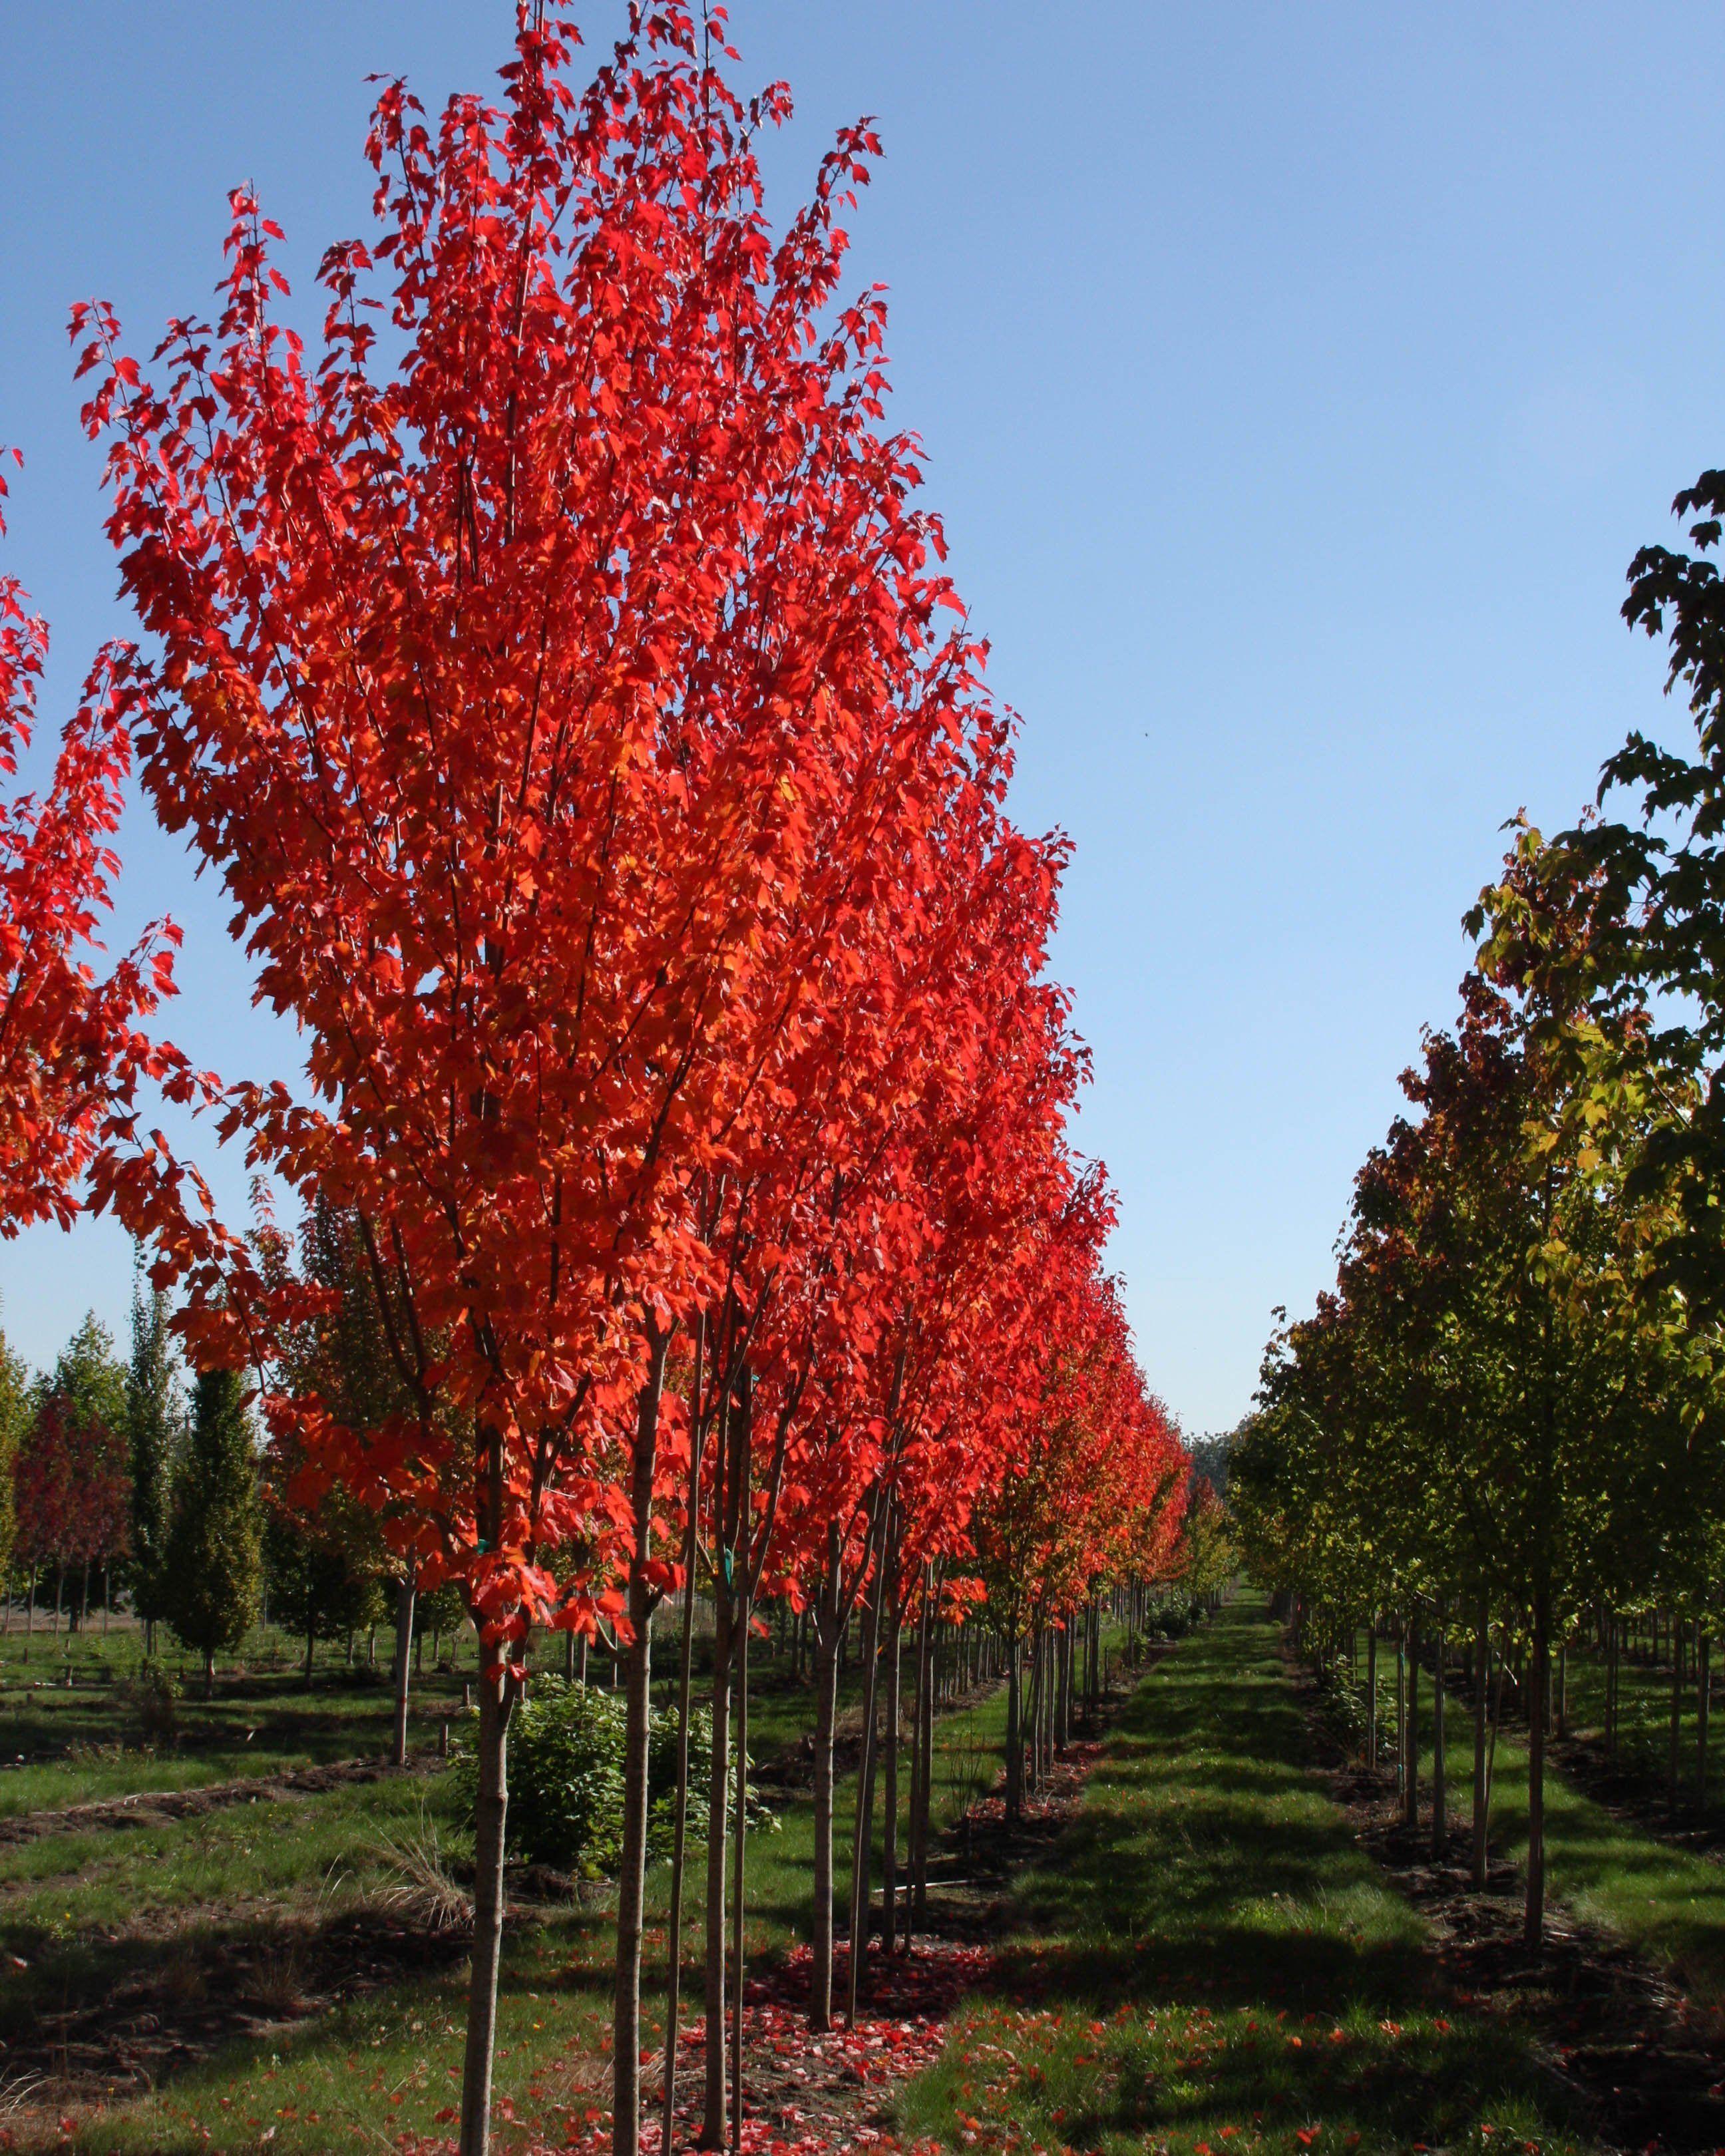 Maple 'Red Rocket' Landscape, Deciduous trees, Beautiful